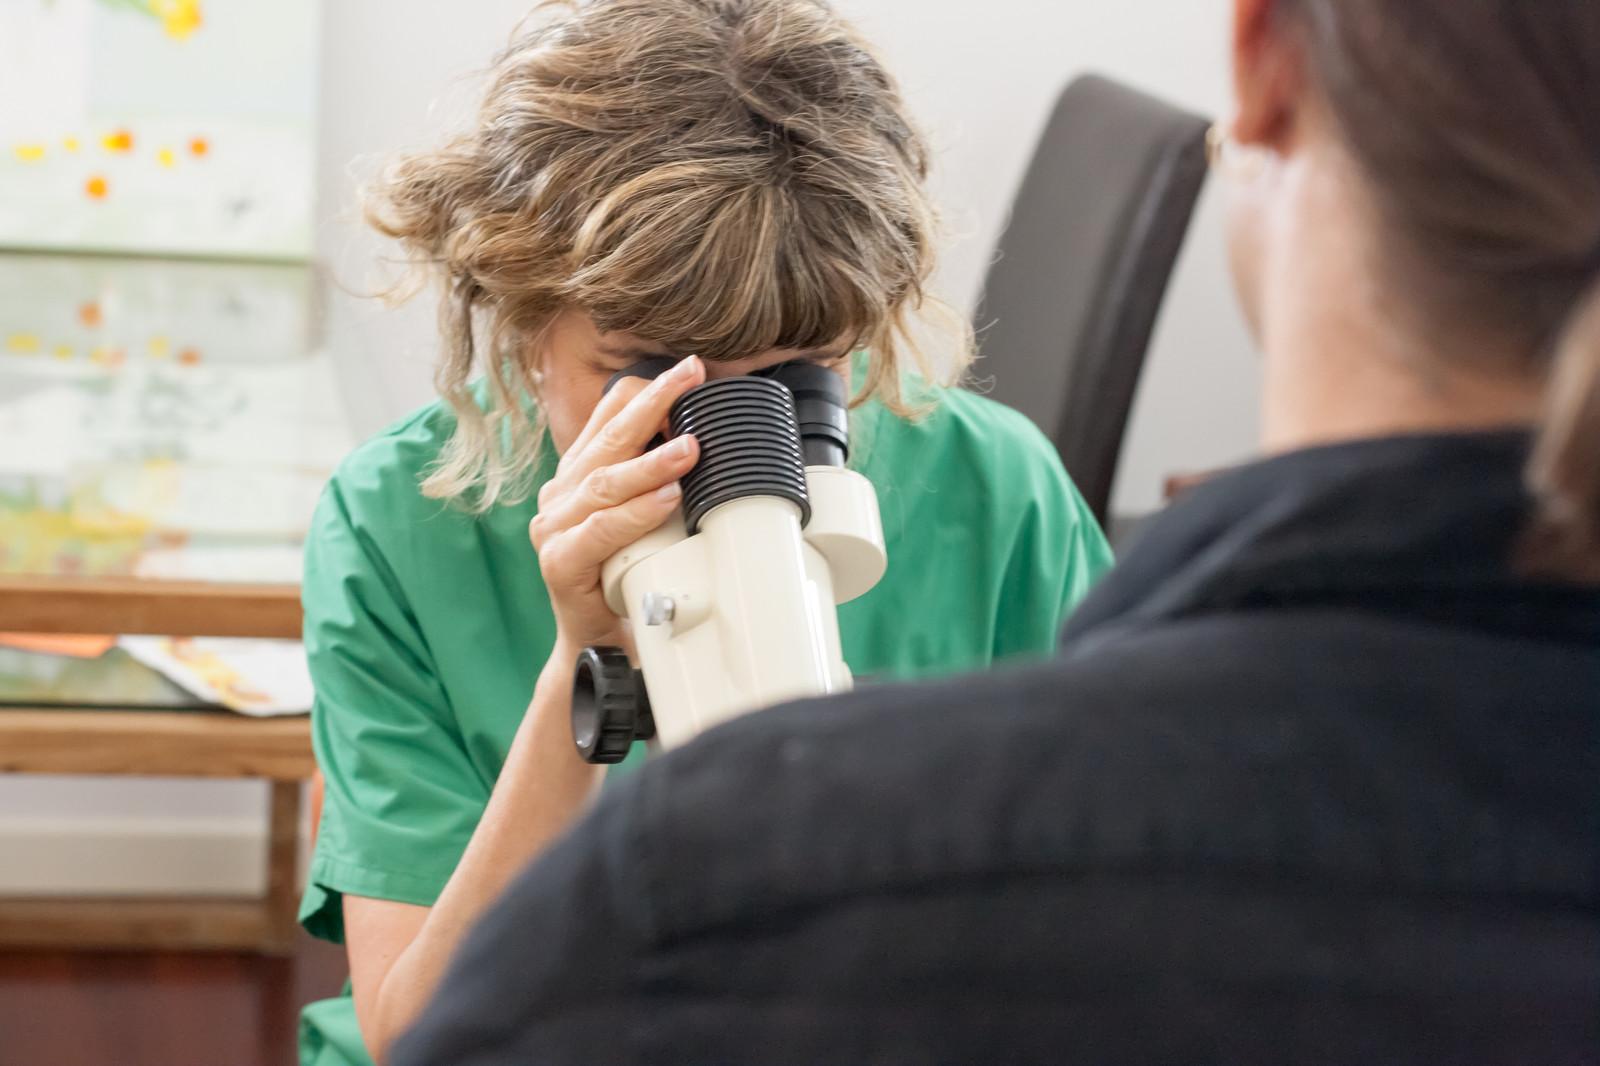 terapia papilloma virus nelluomo